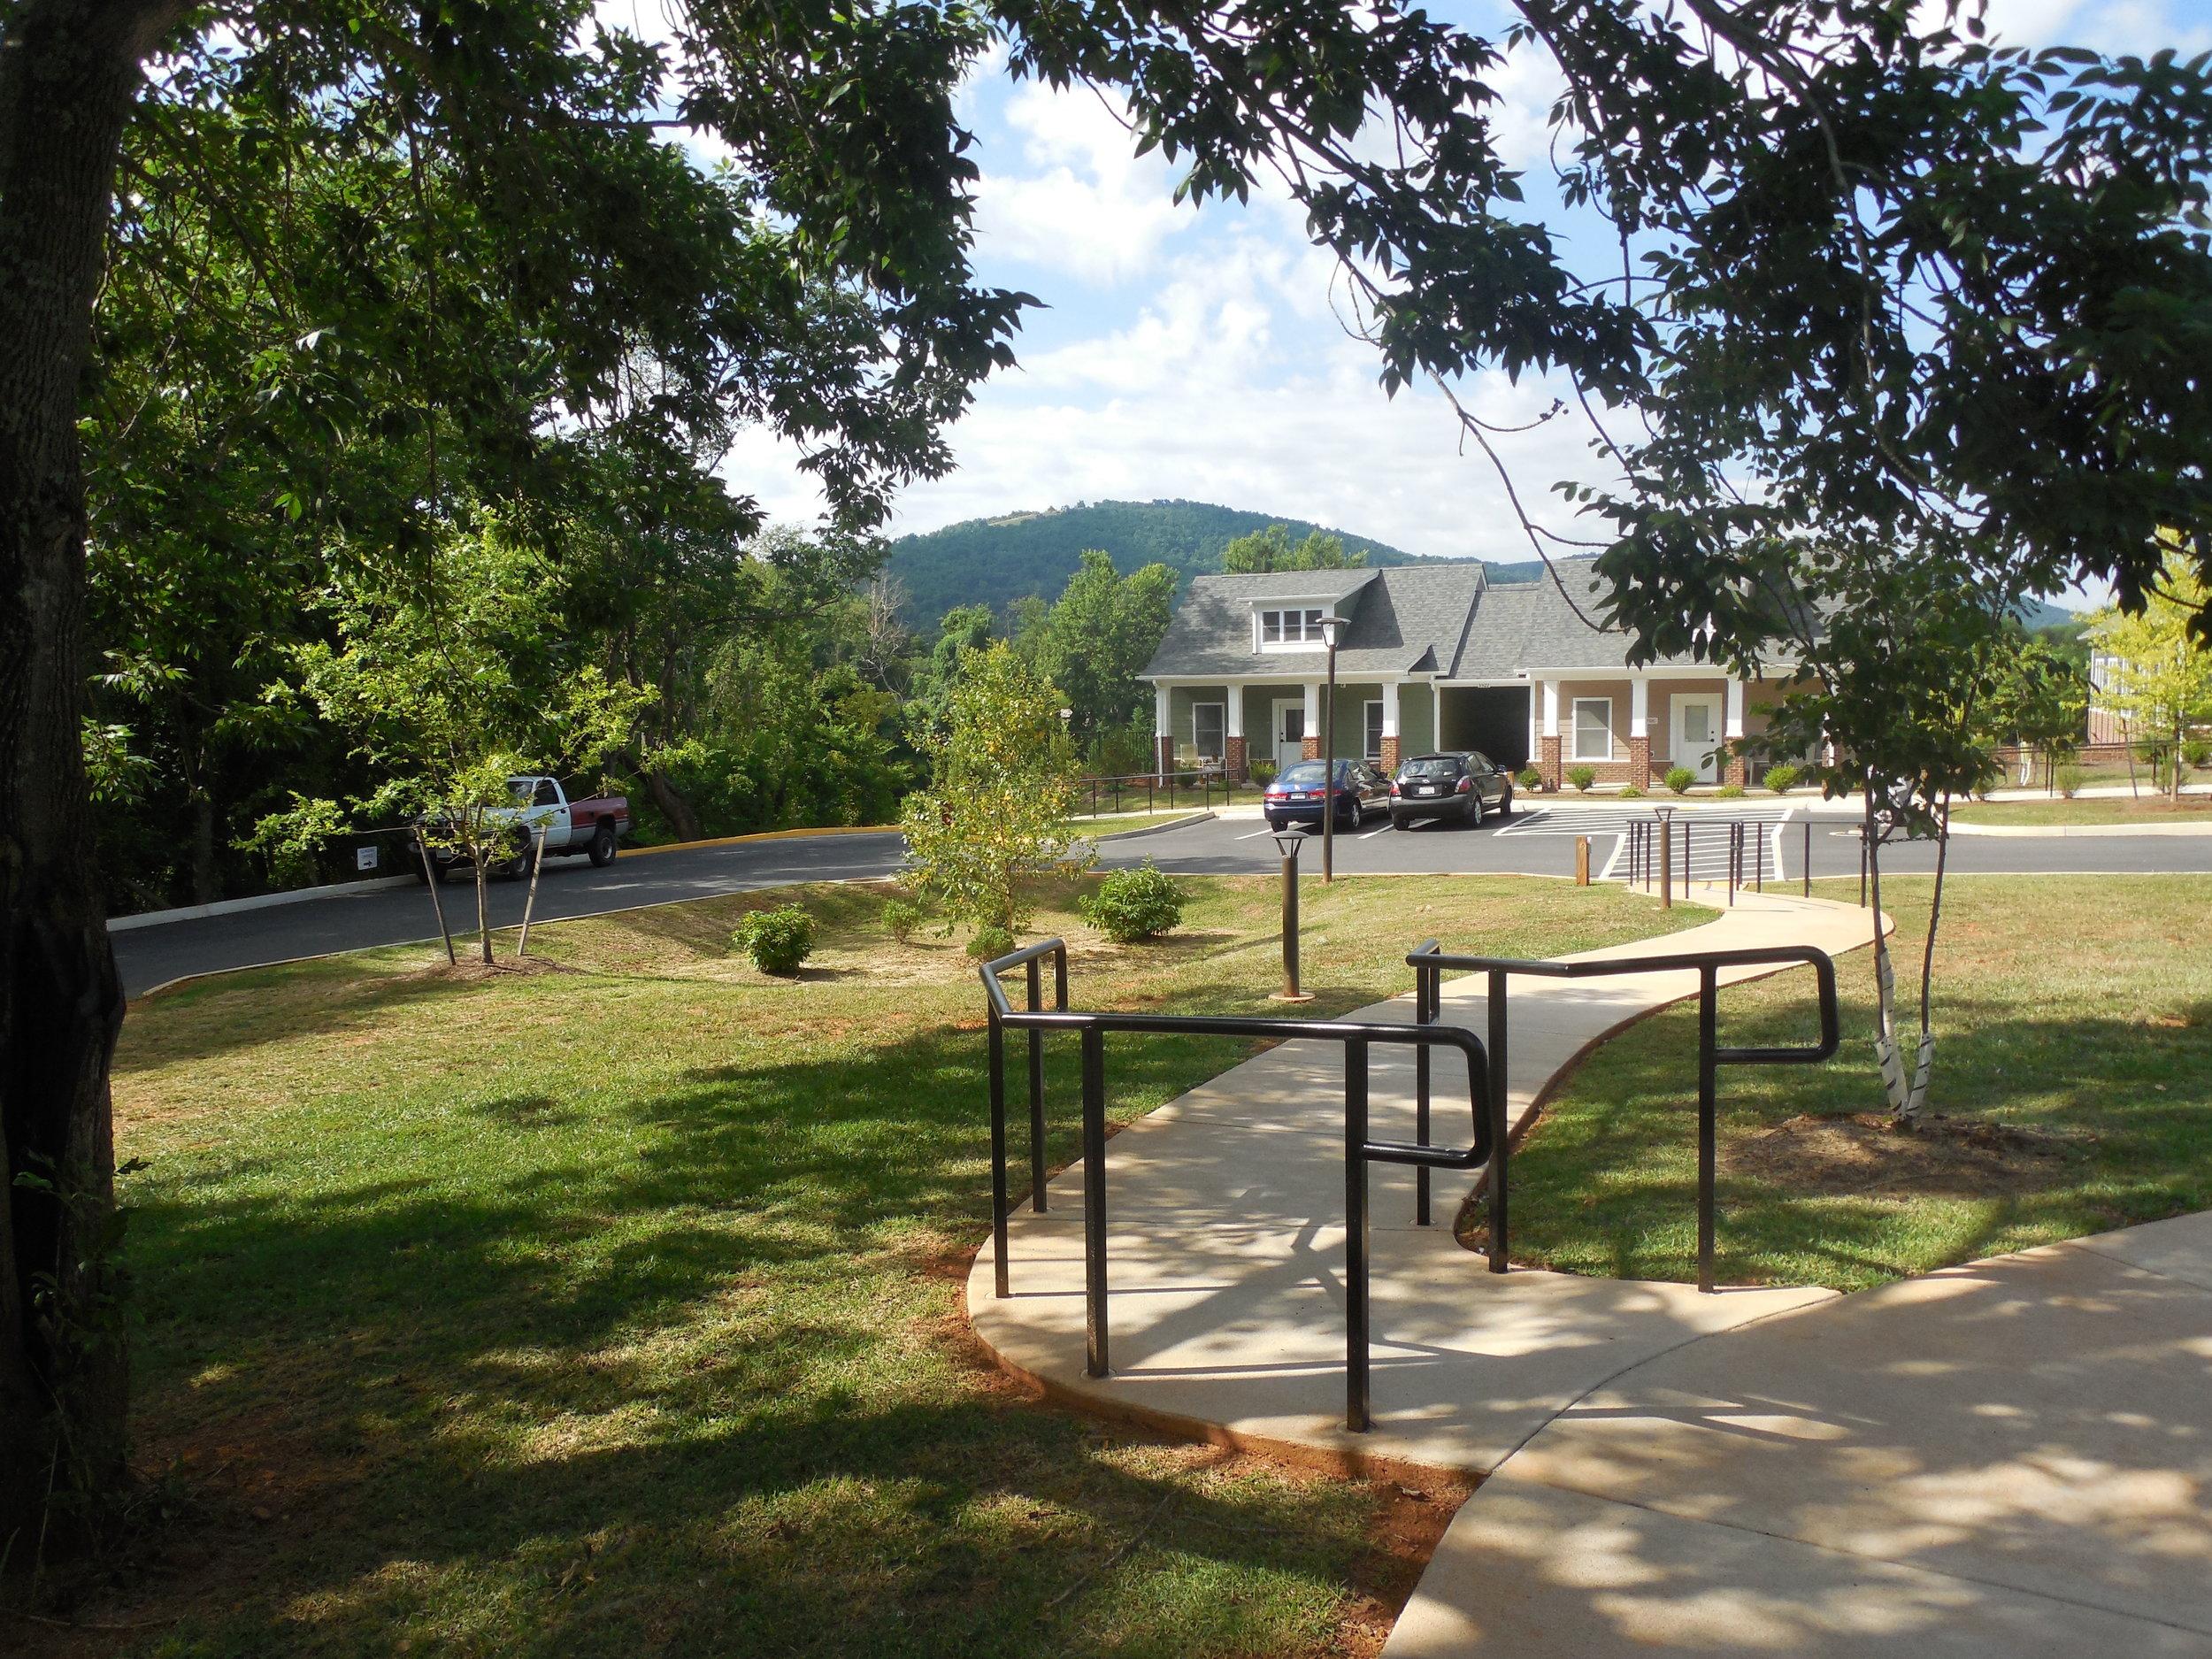 Timberlake Place. JABA's affordable senior housing development in Charlottesville.